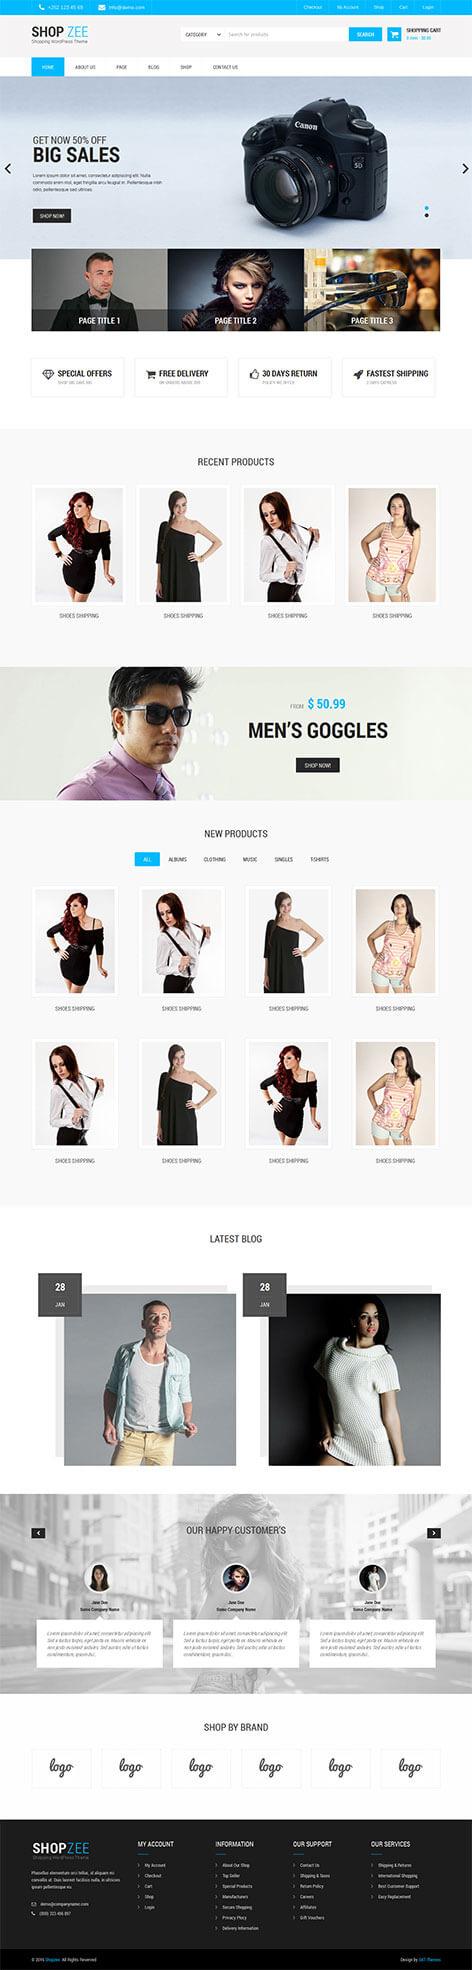 ecommerce WordPress theme